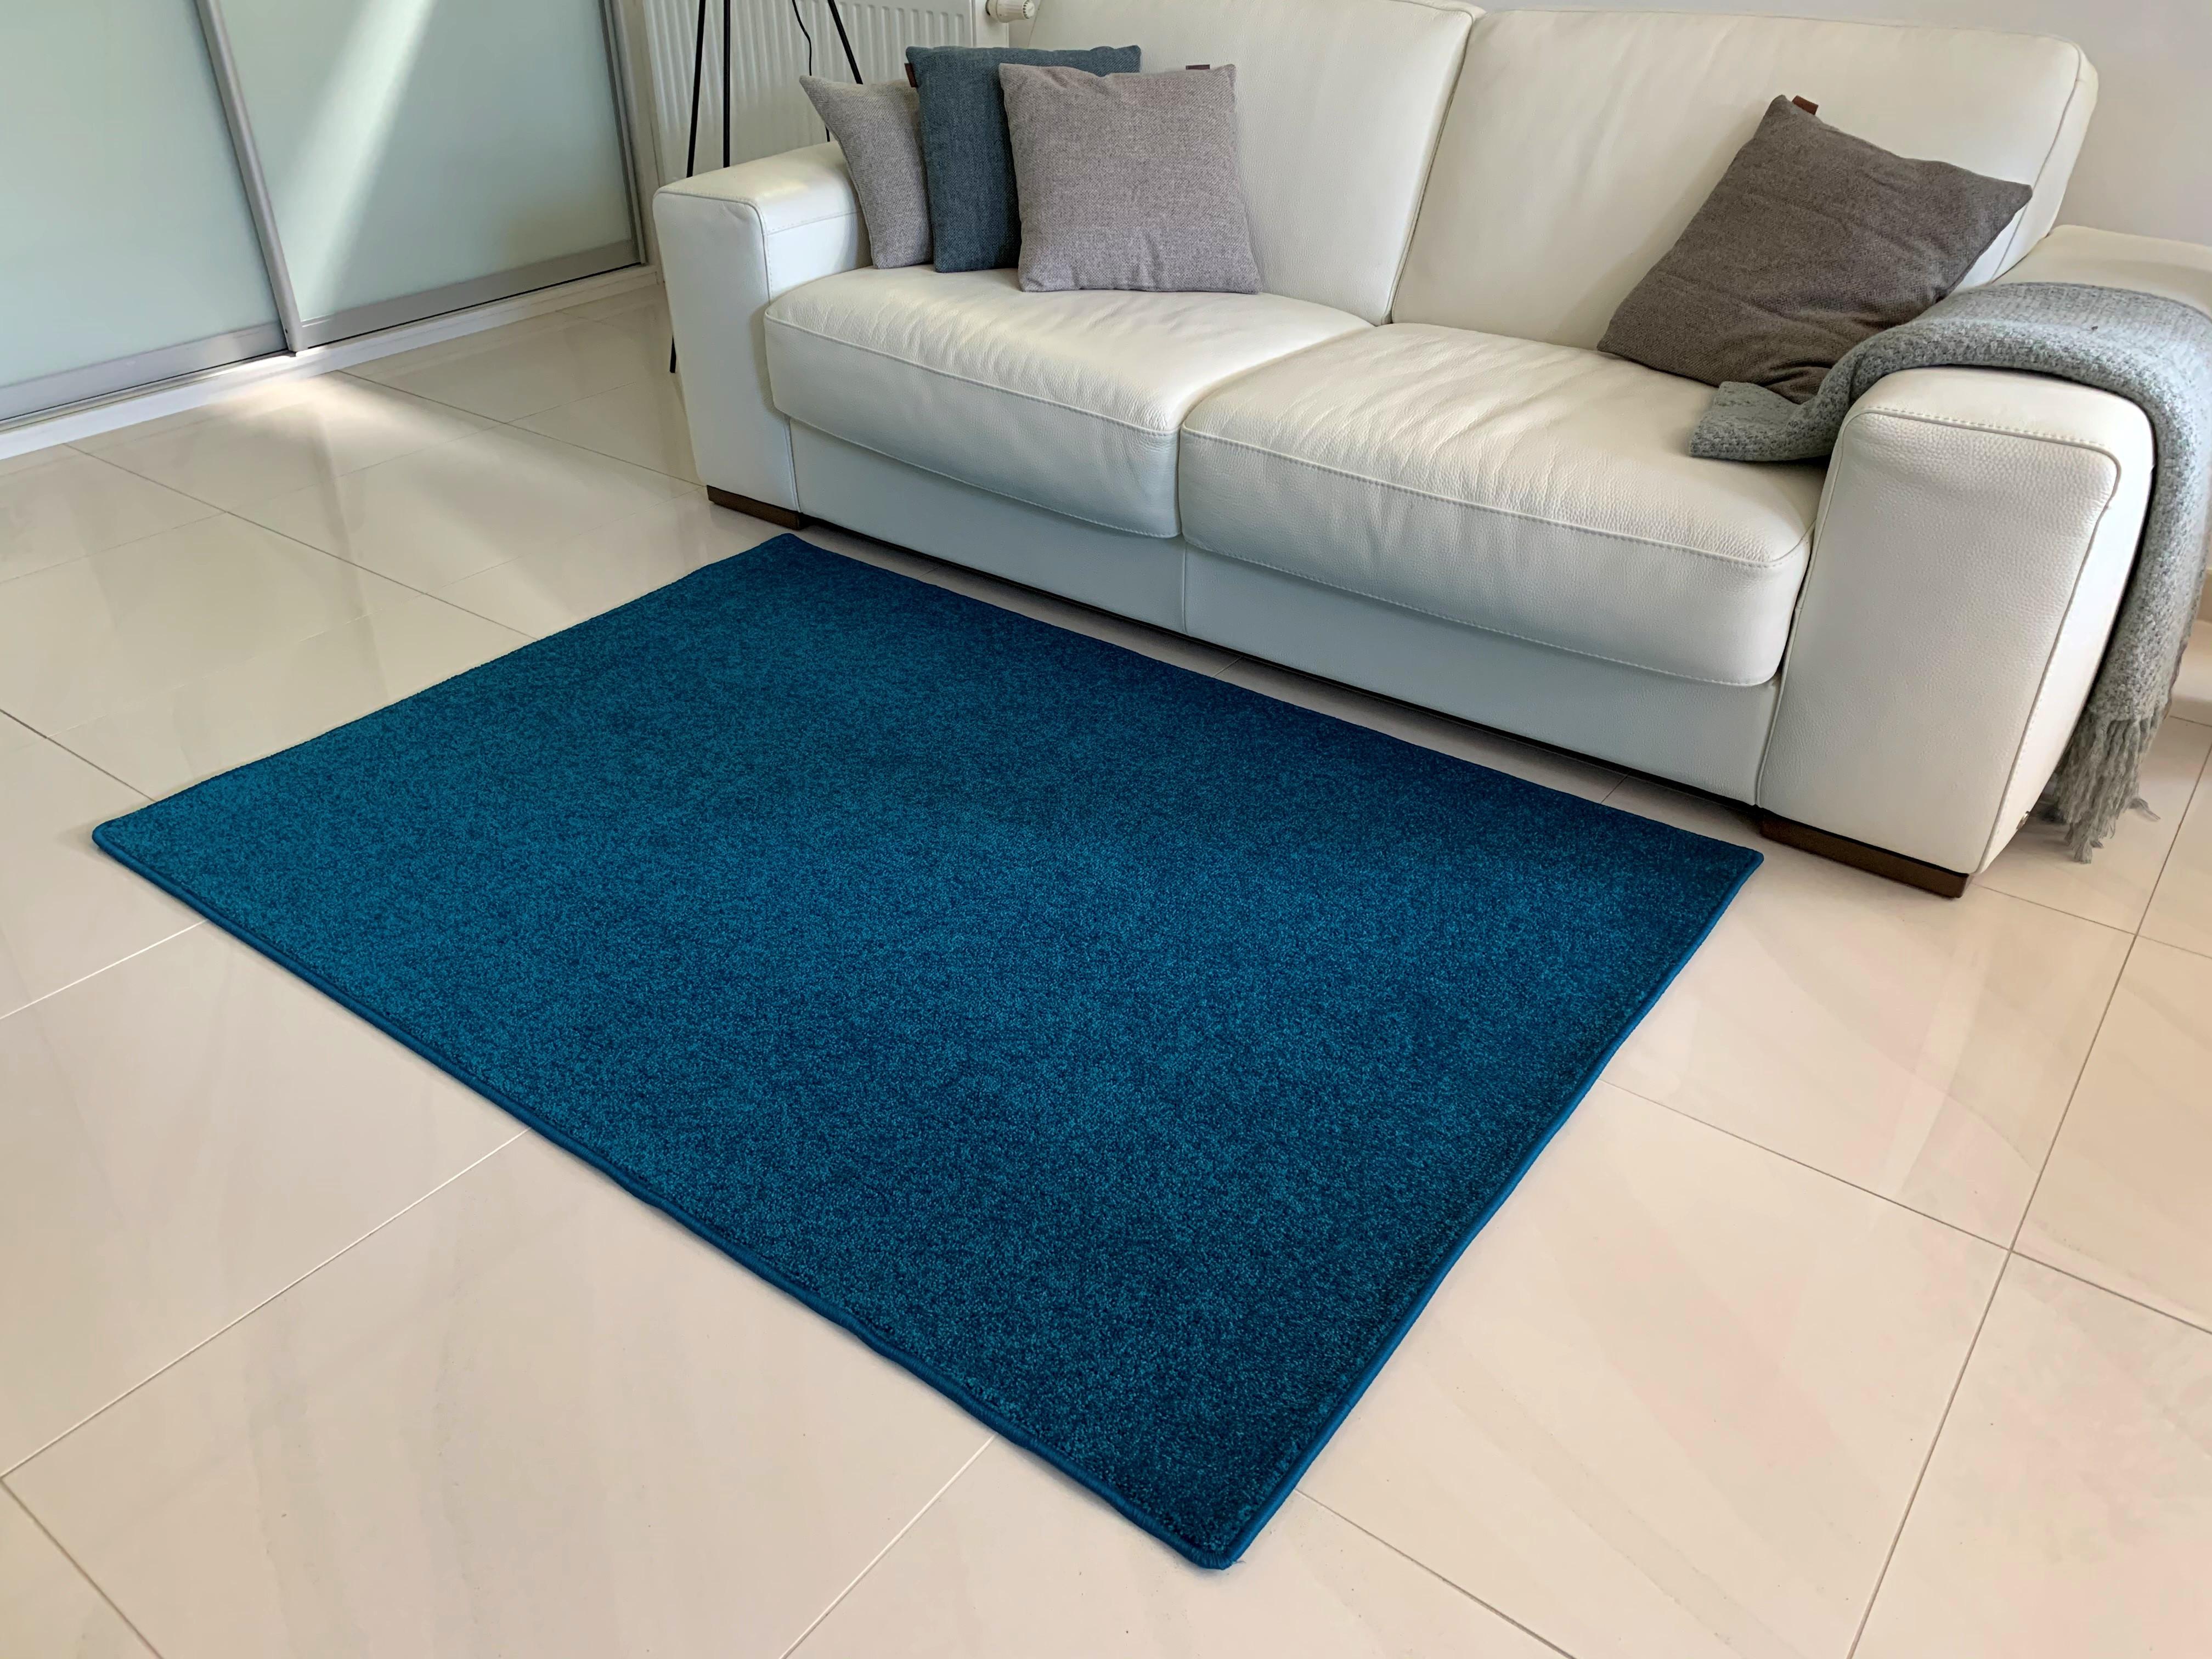 Levně Vopi koberce Kusový koberec Eton Exklusive turkis - 280x370 cm Modrá